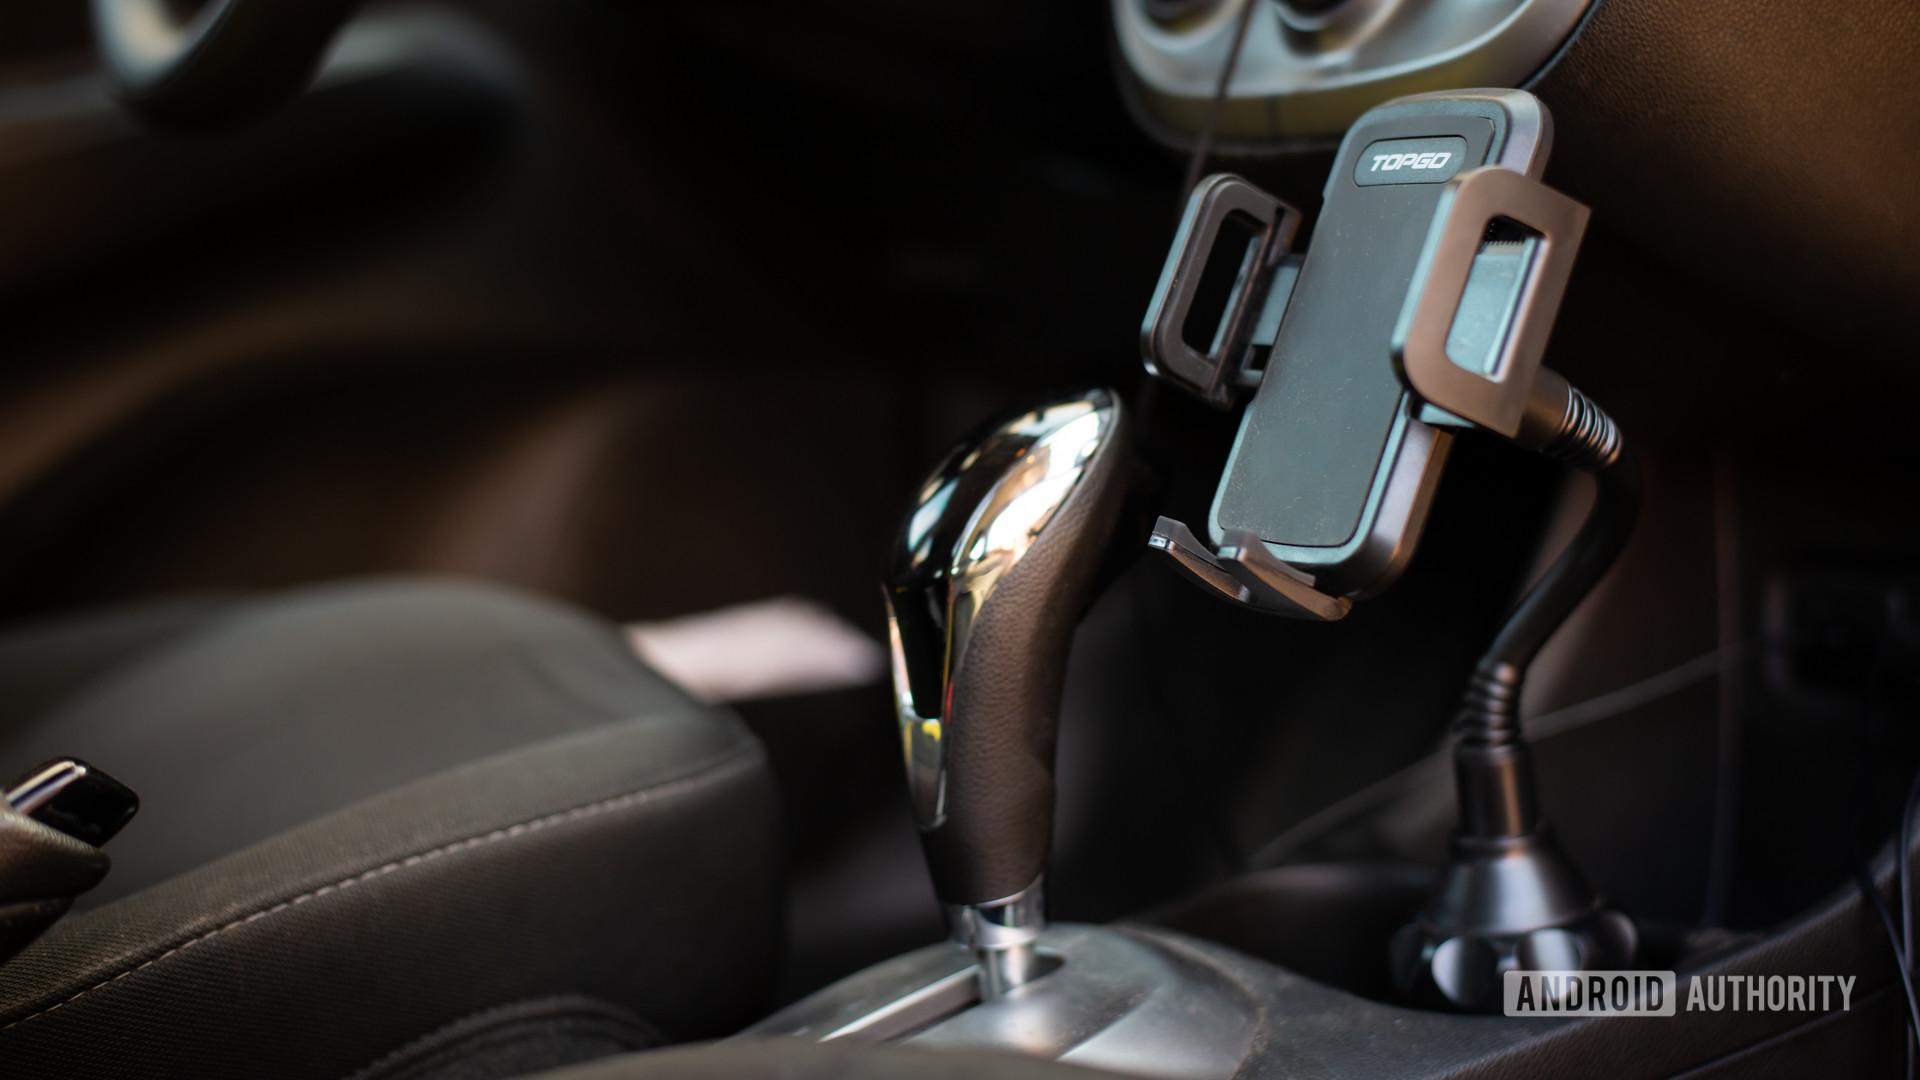 TopGo Cup Holder car phone holder